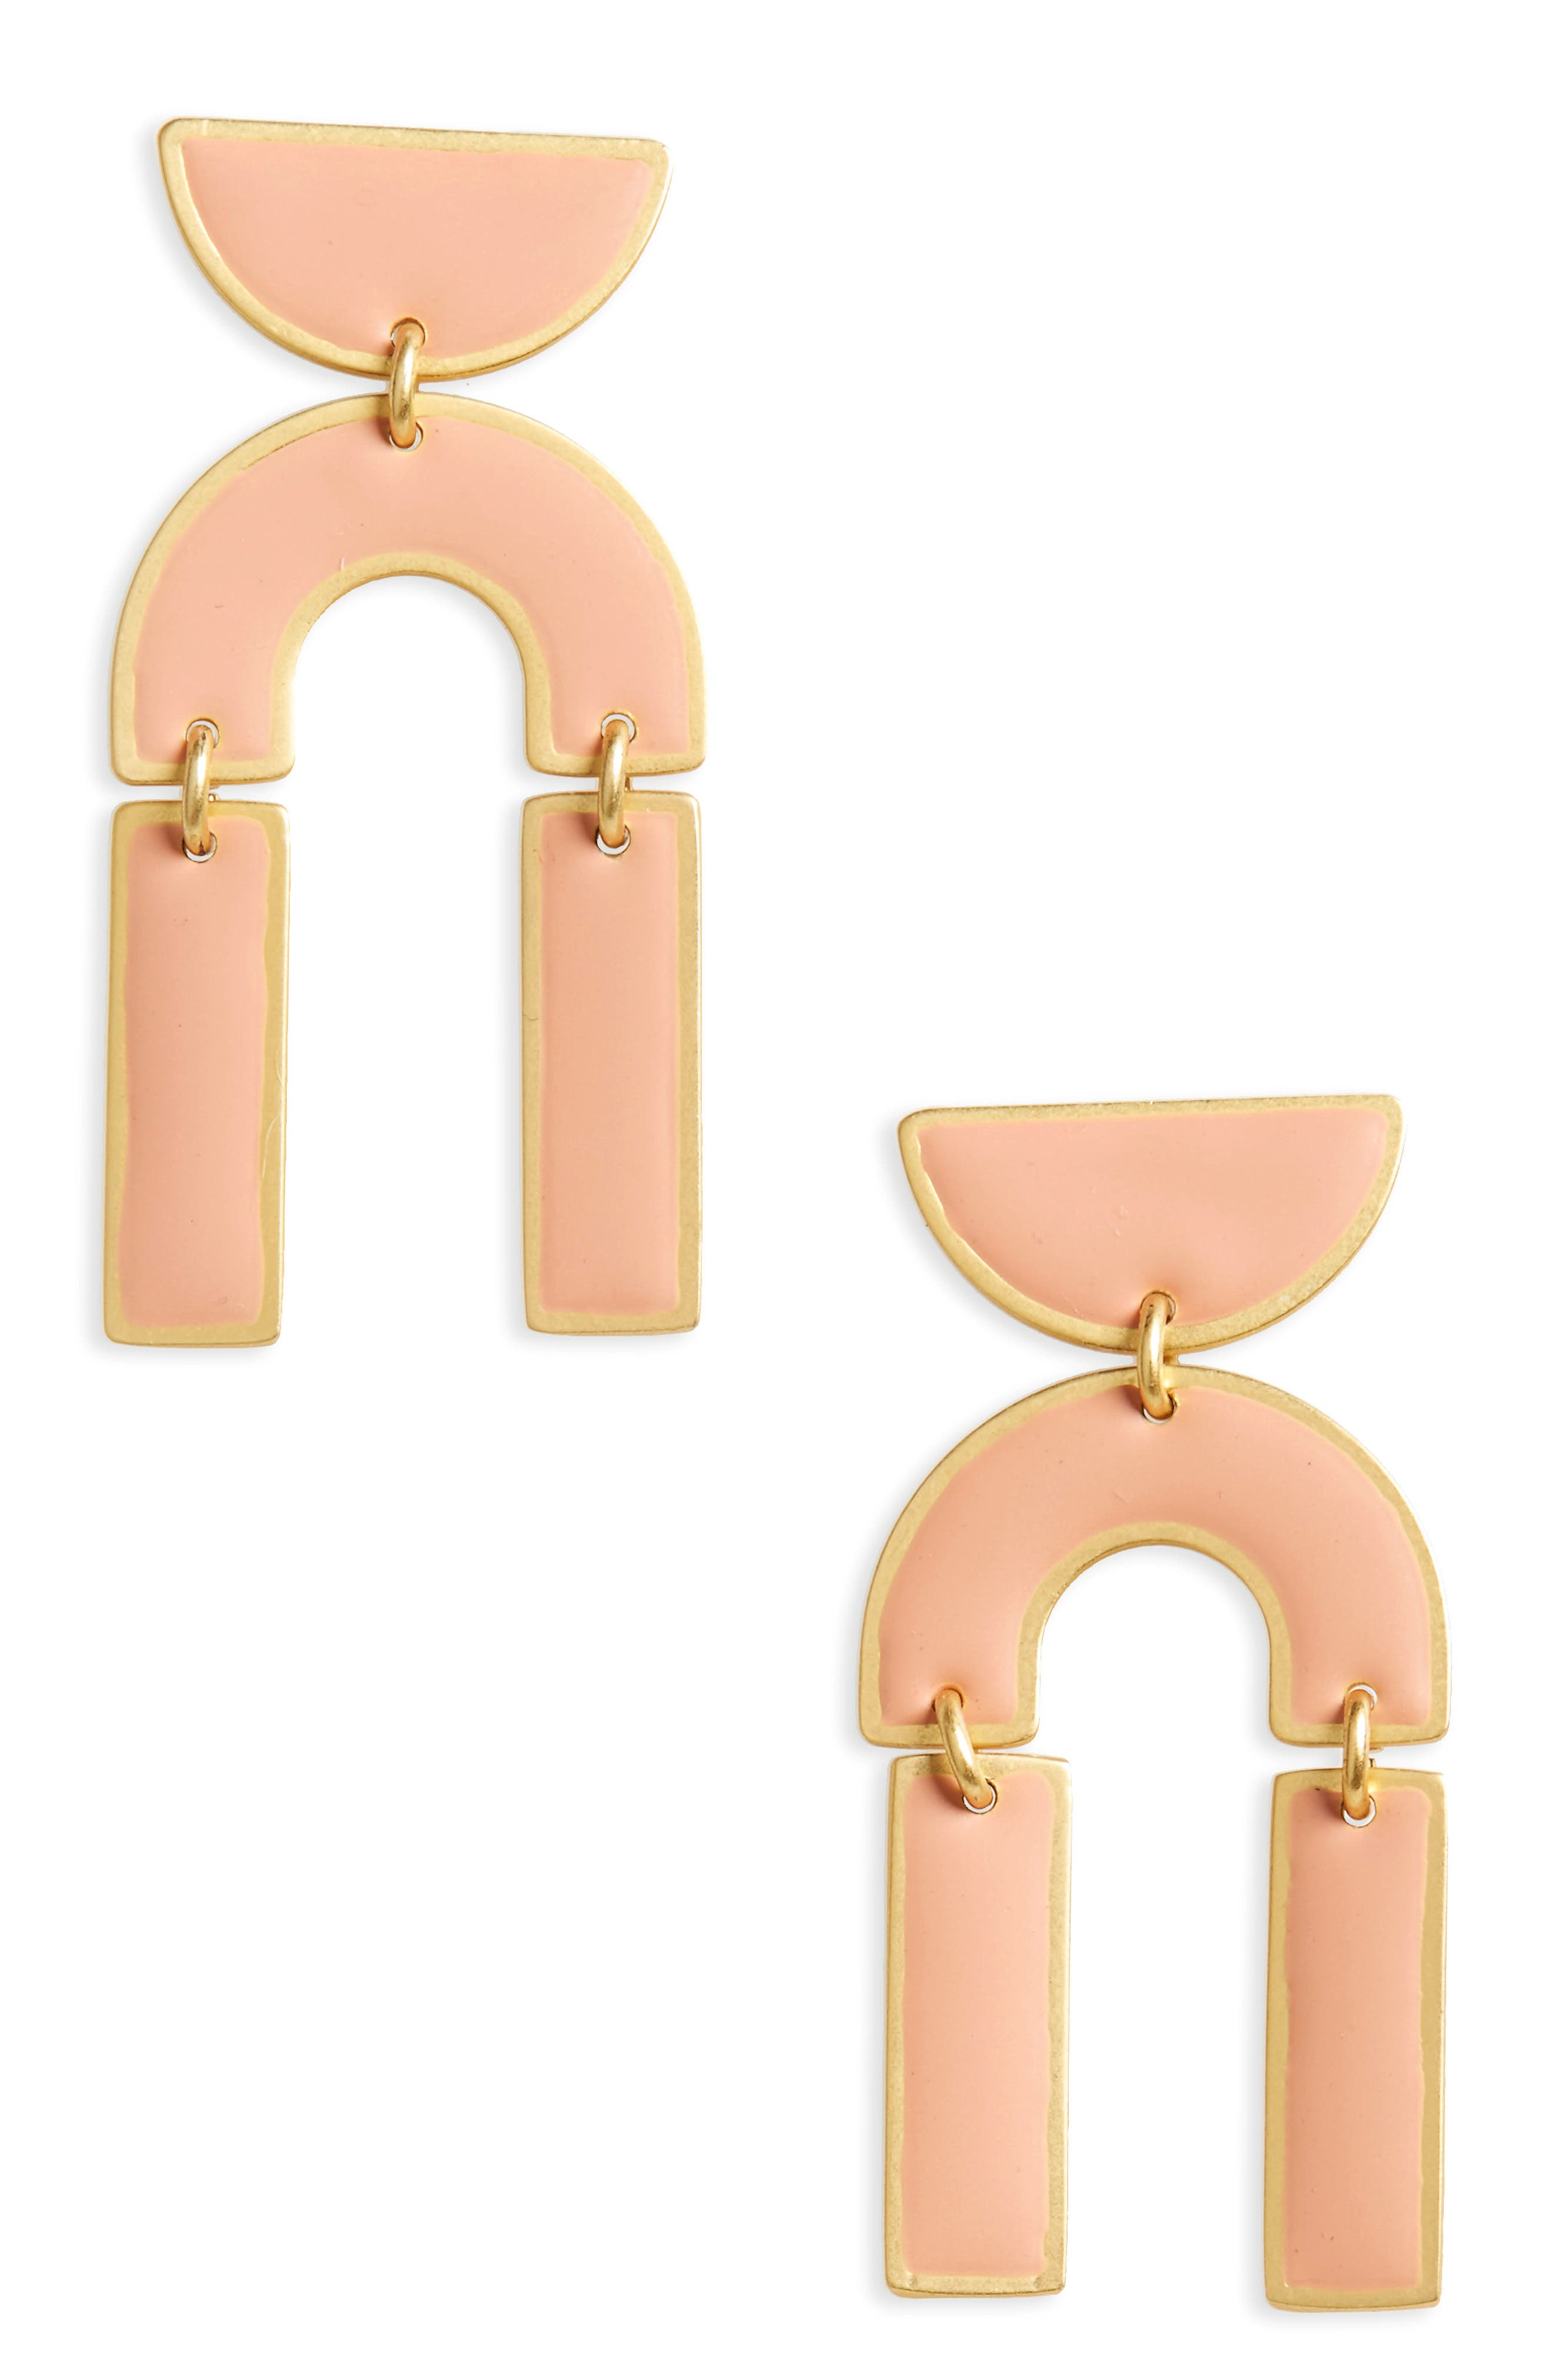 Modernism Half-Drop Earrings,                         Main,                         color,